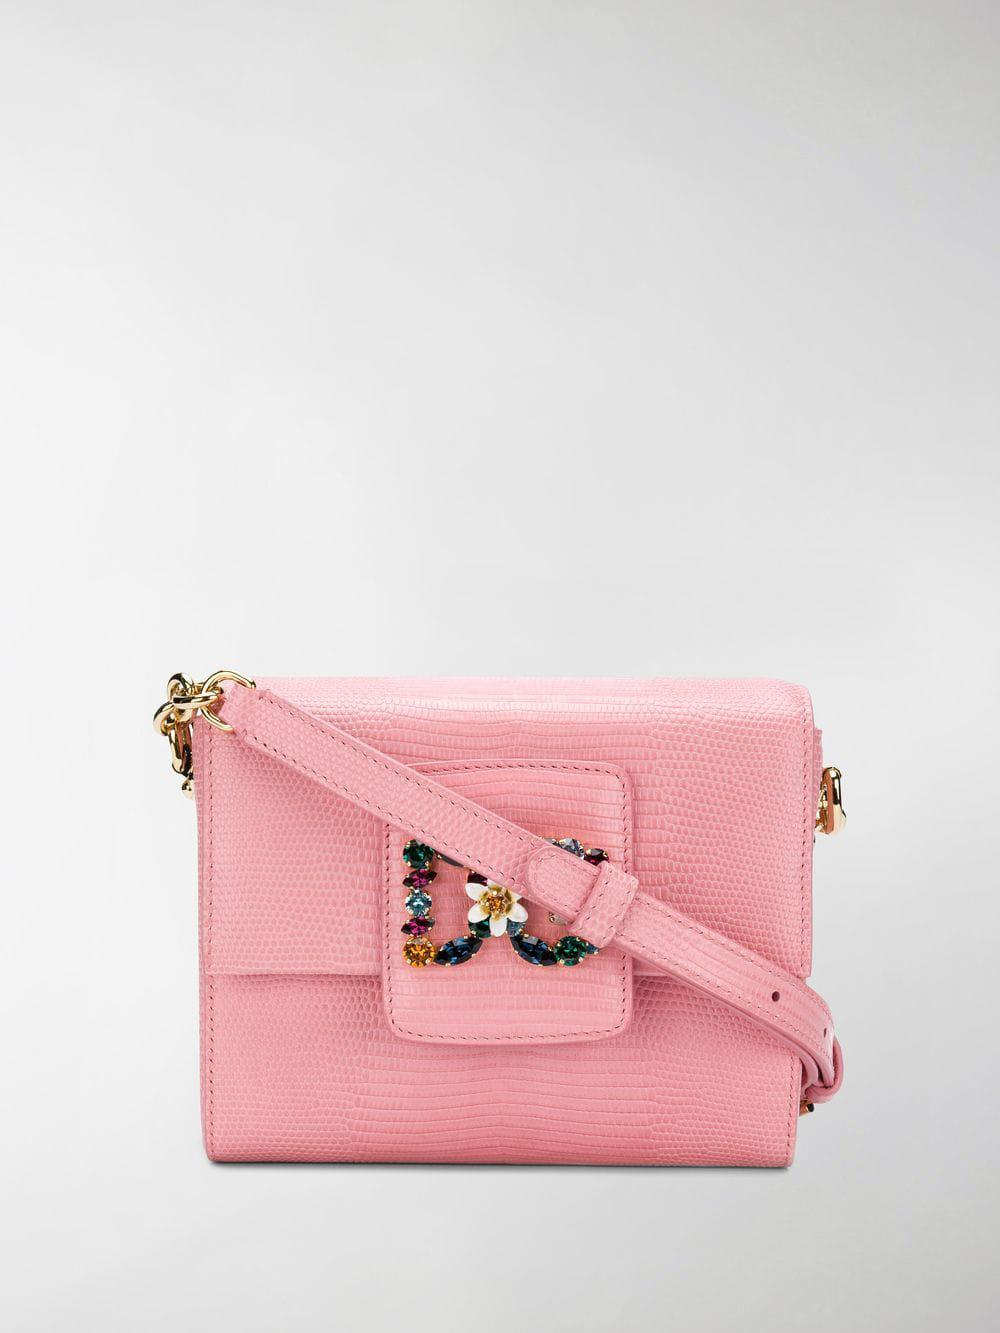 Dolce & Gabbana Leather Dg Millennials Mini Crossbody Bag in Pink